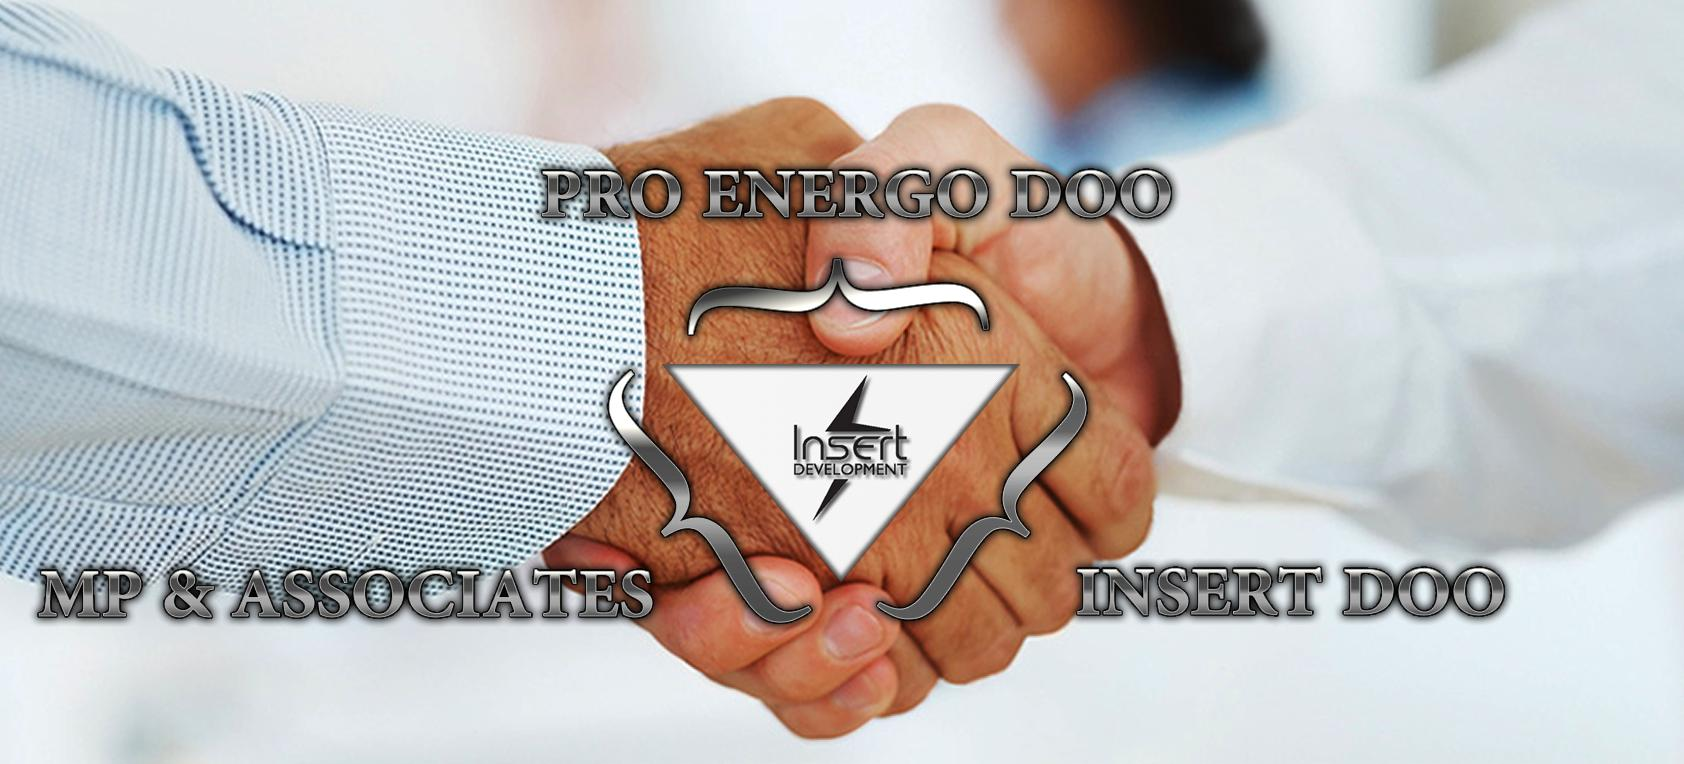 Insert Development operated by three partners: INSERT DOO, MP and Associates DOO, and PRO ENERGO DOO.